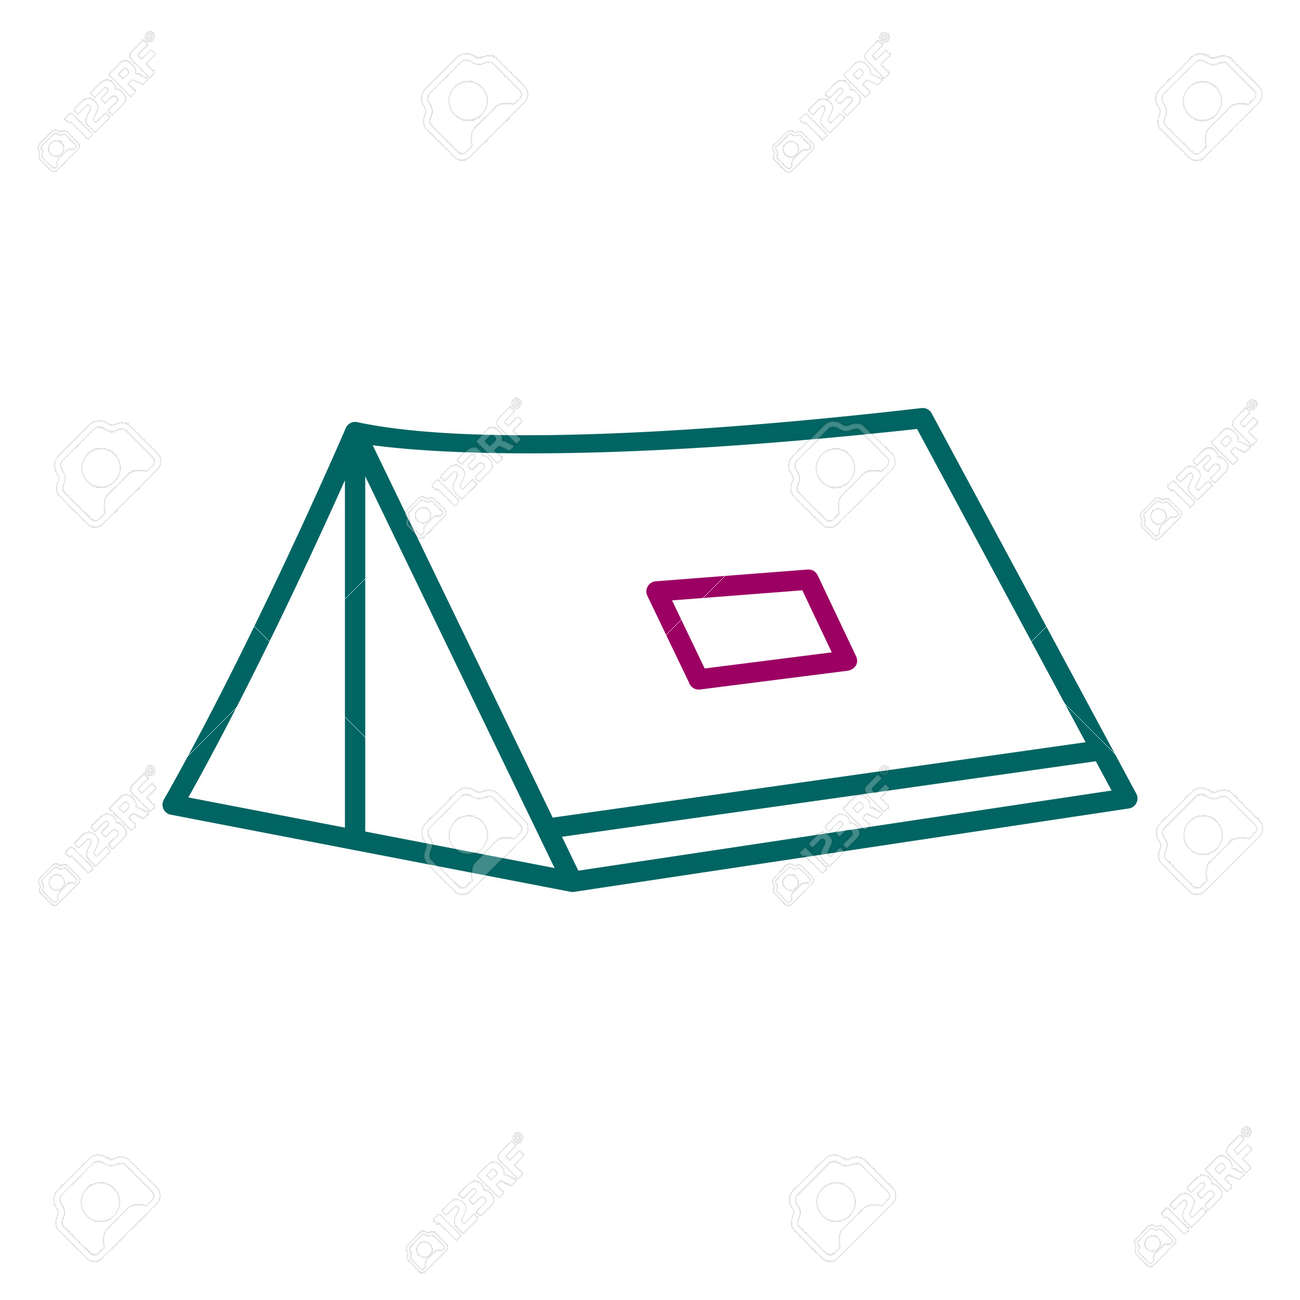 Unique Tent Line Vector Icon - 167962509